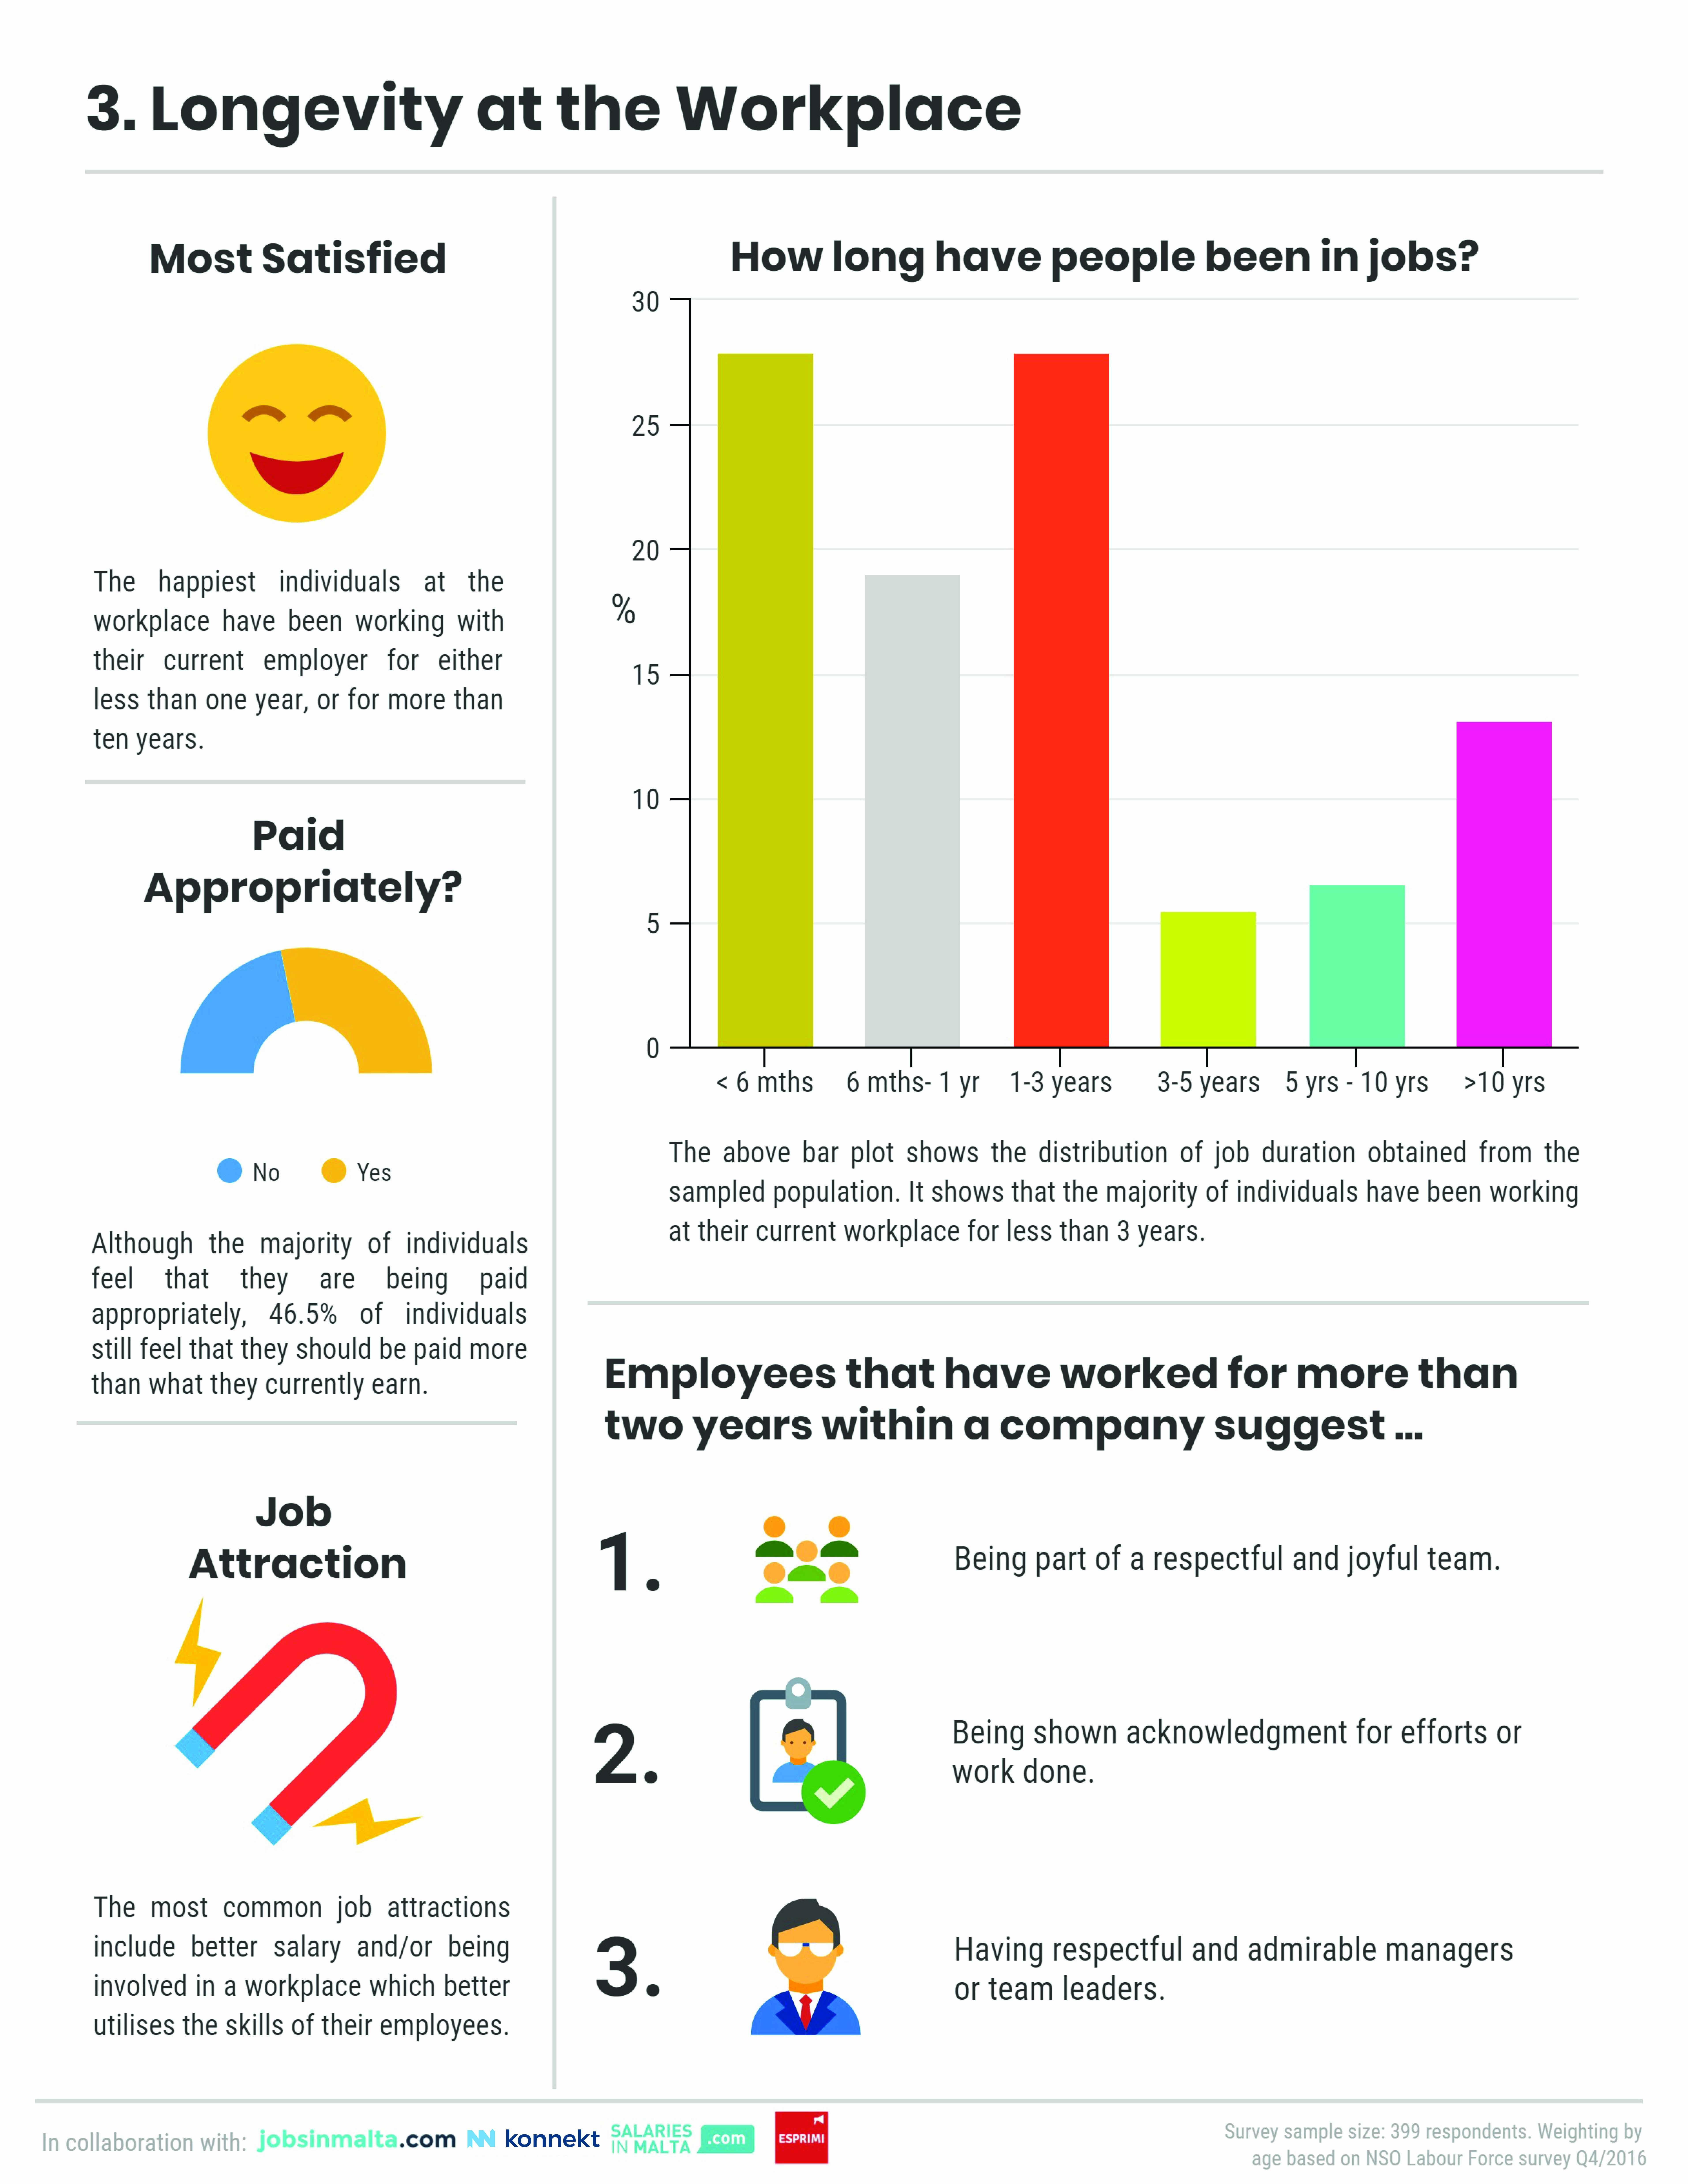 Longevity at the workplace - Konnekt